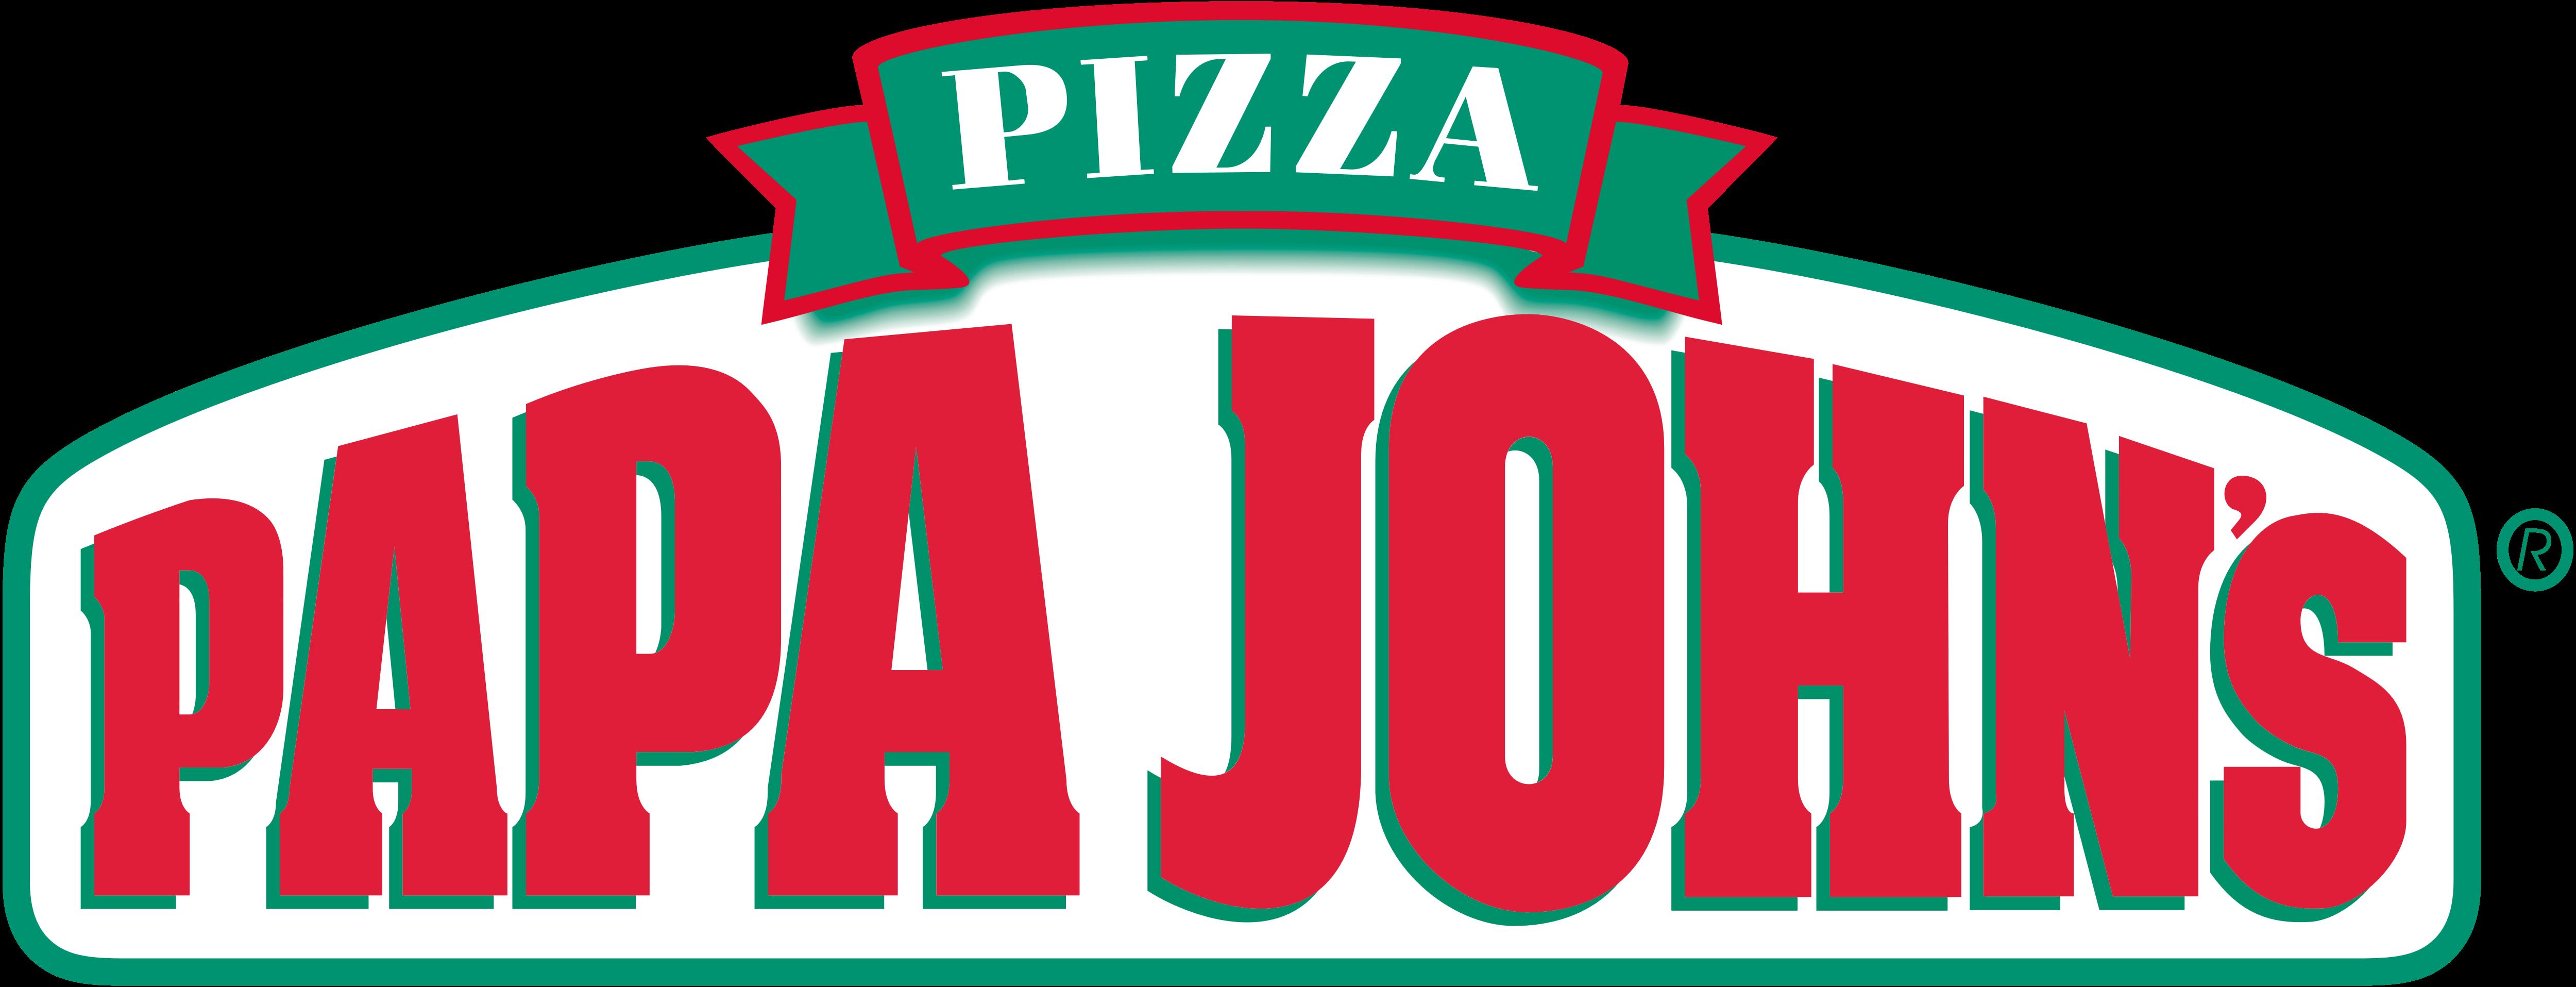 Papa Johns Logo Wallpaper